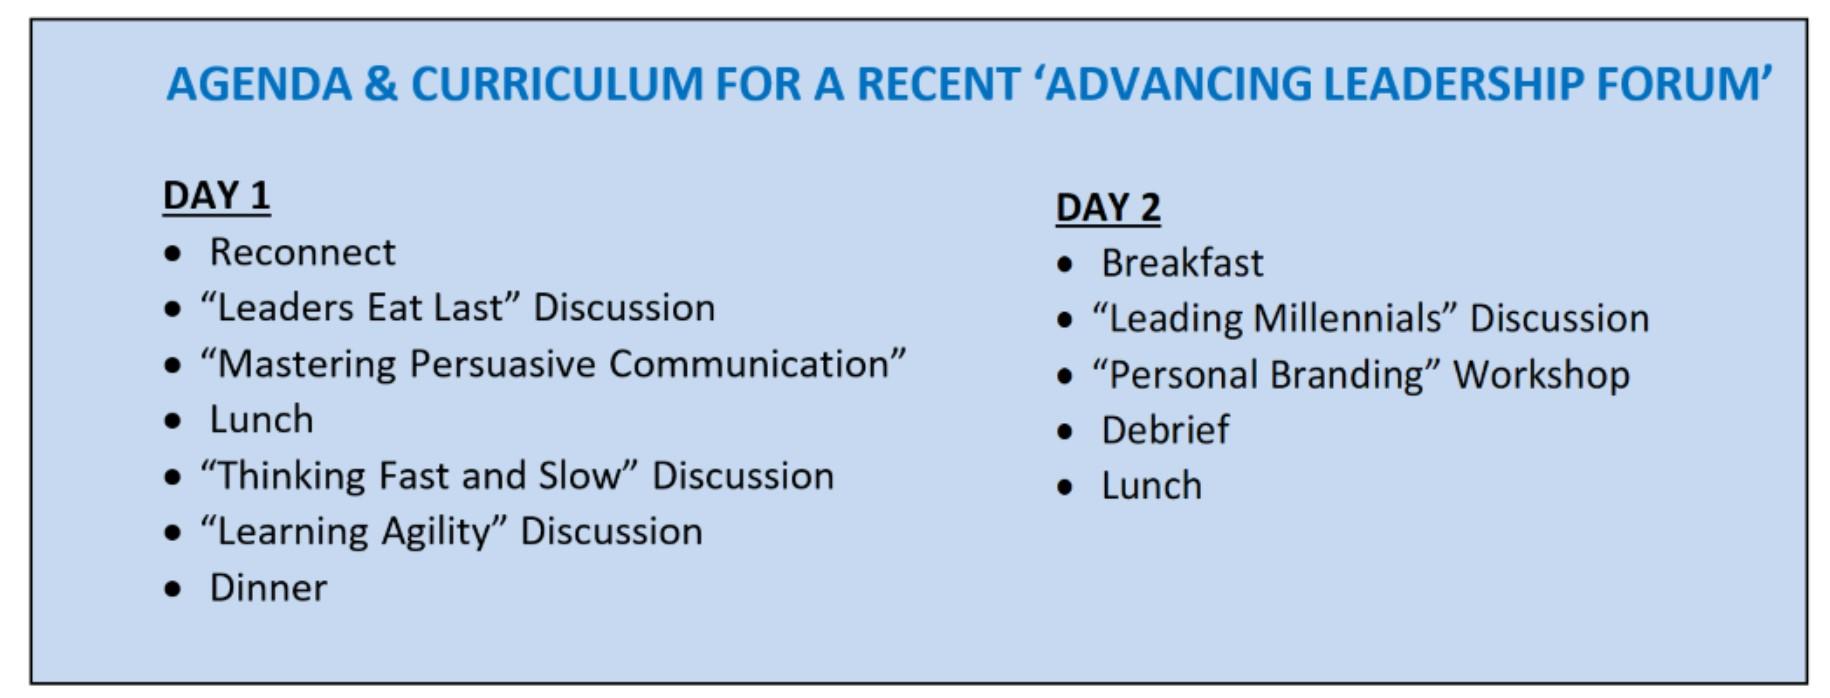 CEE Sample Agenda 2019.jpg